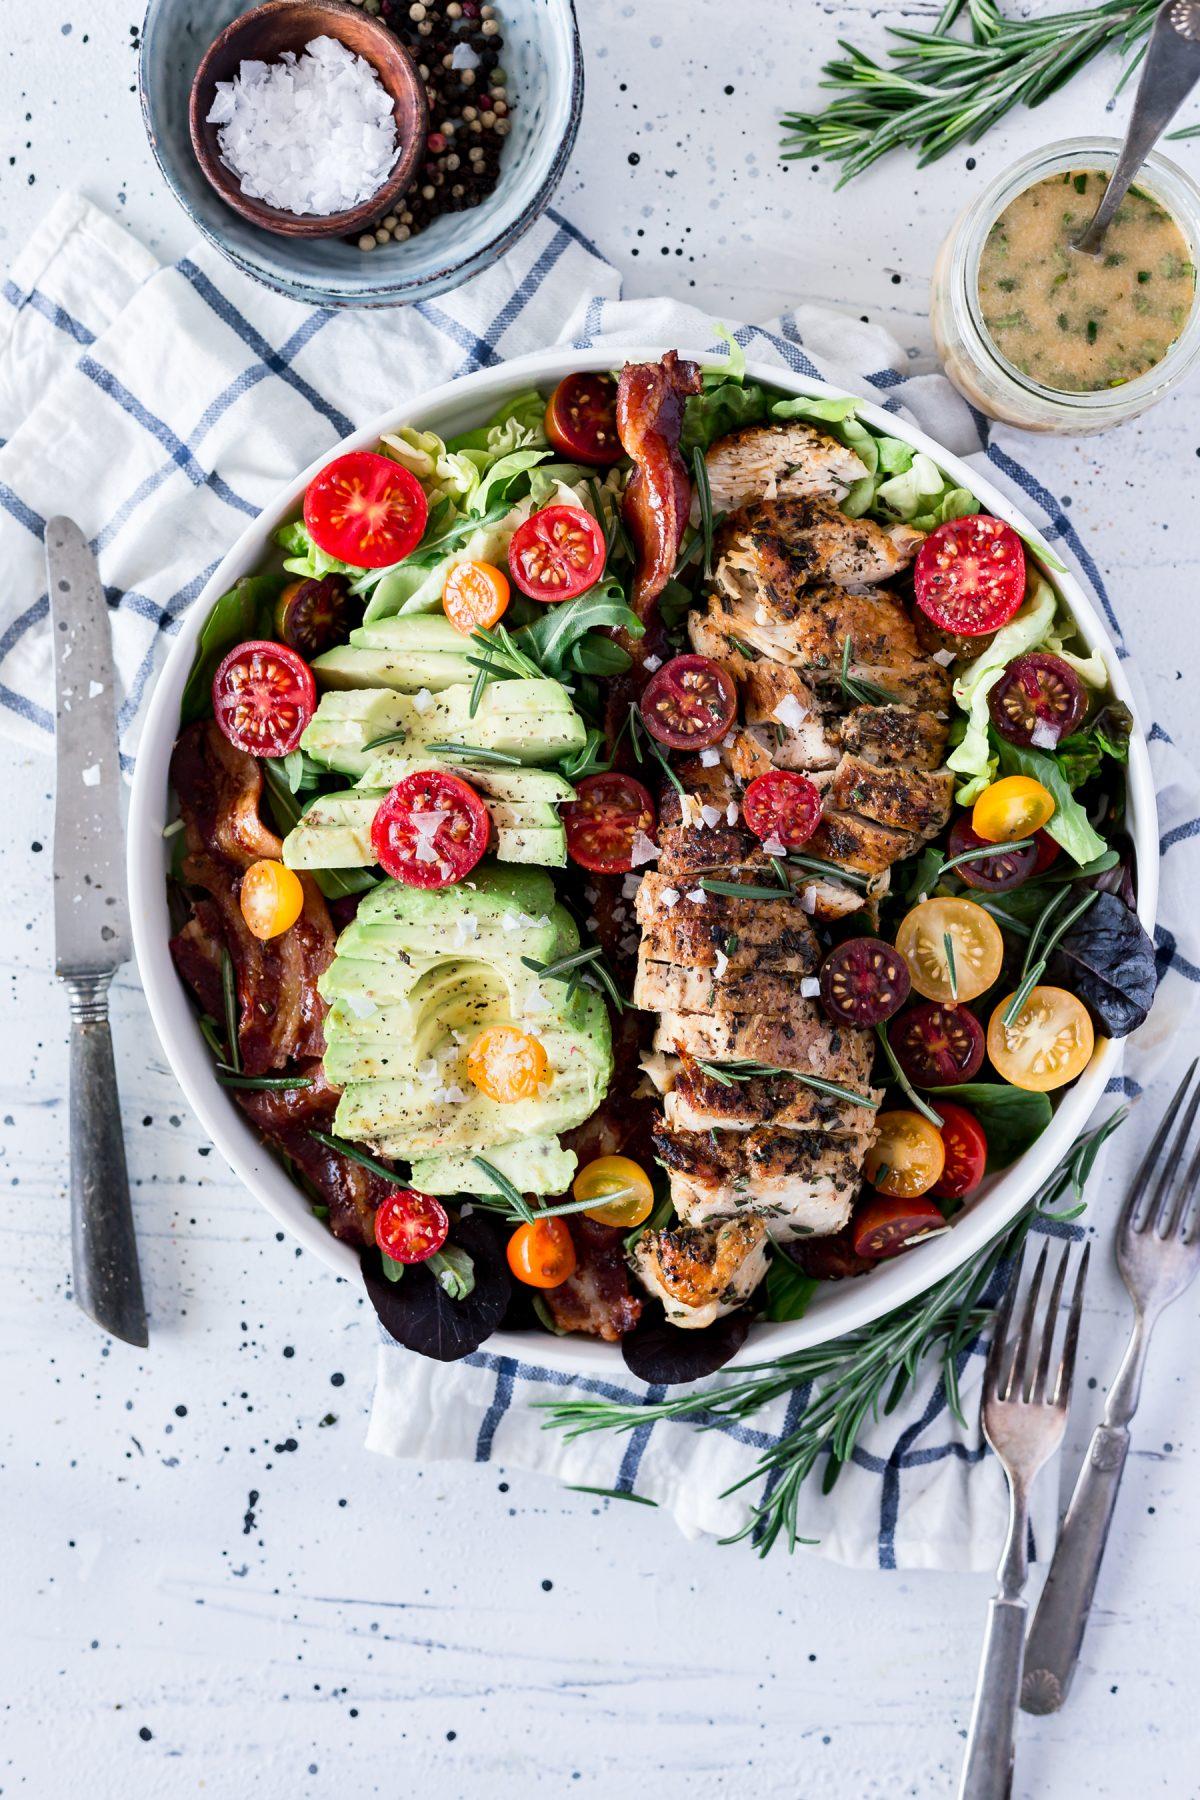 Rosemary Chicken Bacon Avocado Salad